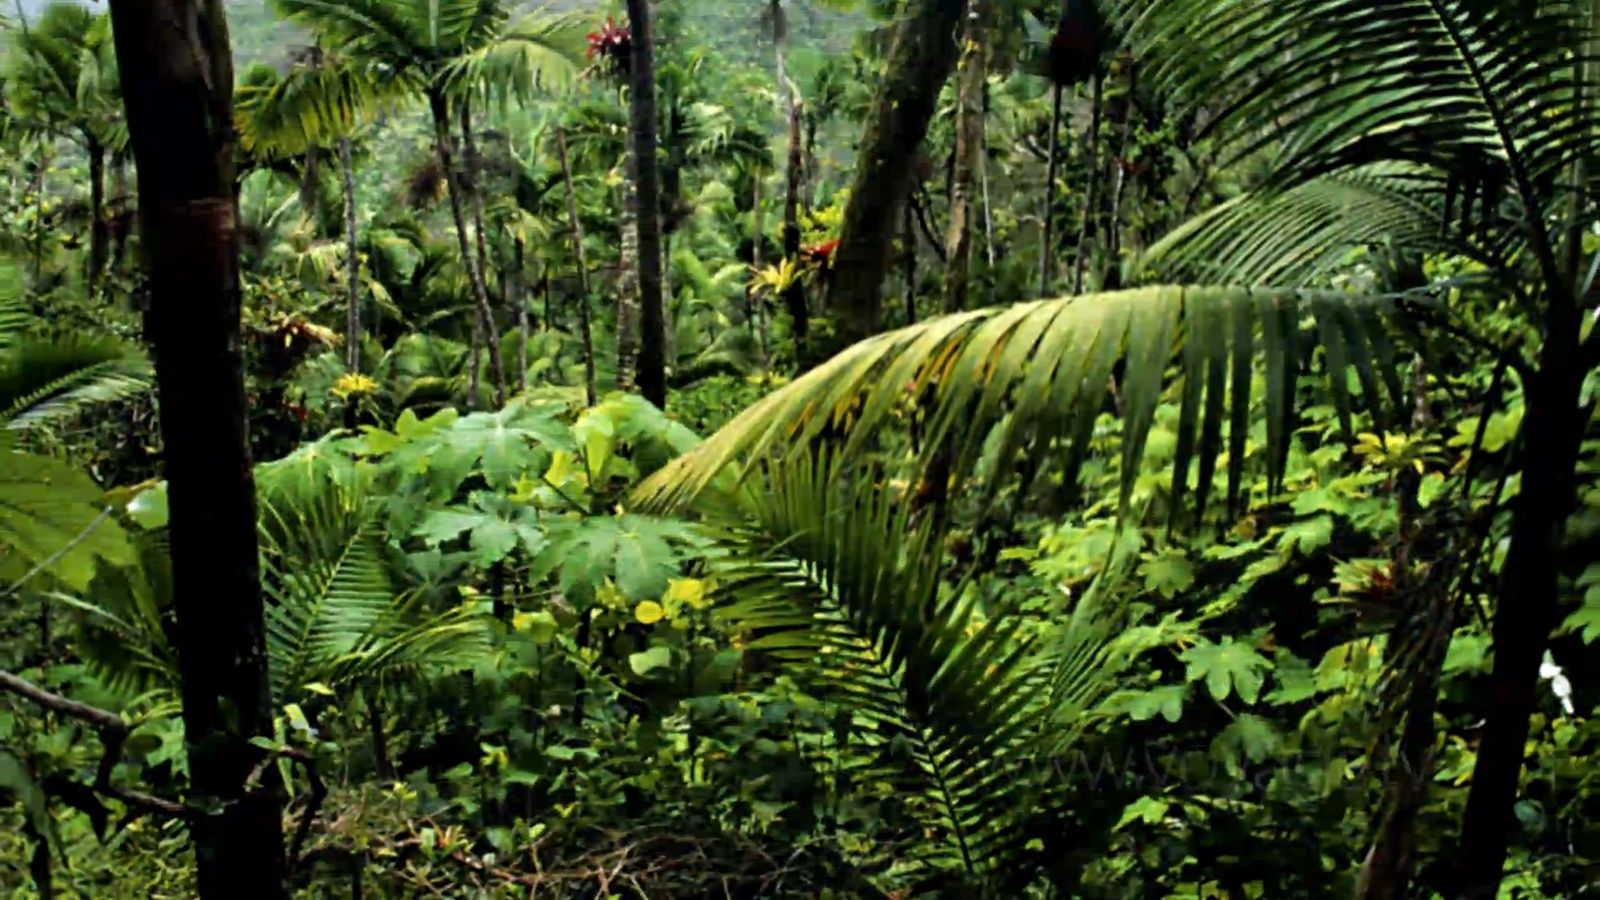 Rainforest Plants In The Amazon Rainforest